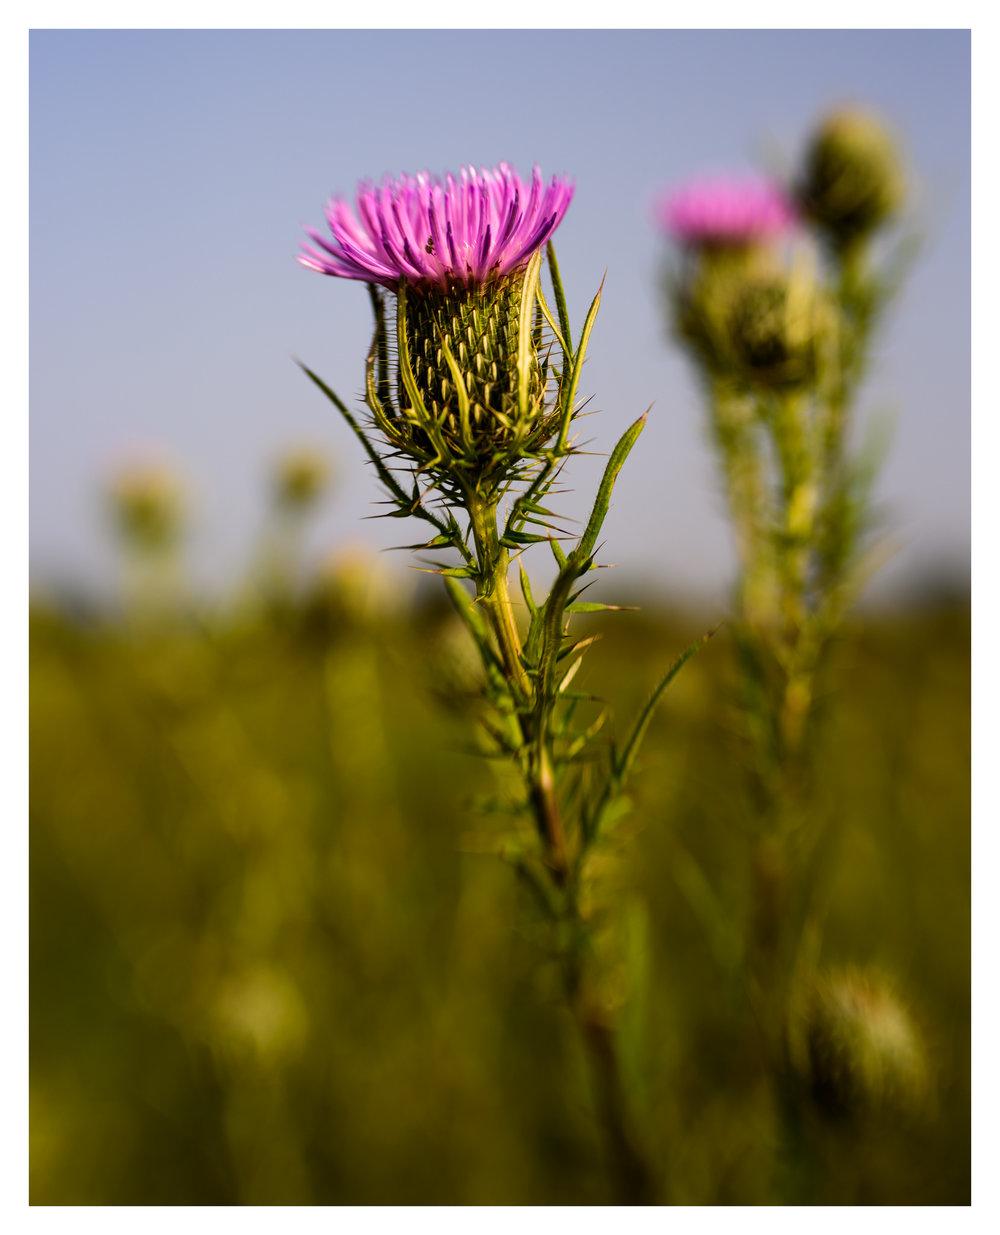 Thistle at Twin Creek Metropark - Nikon D750 w/Lensbaby Sol 45 lens